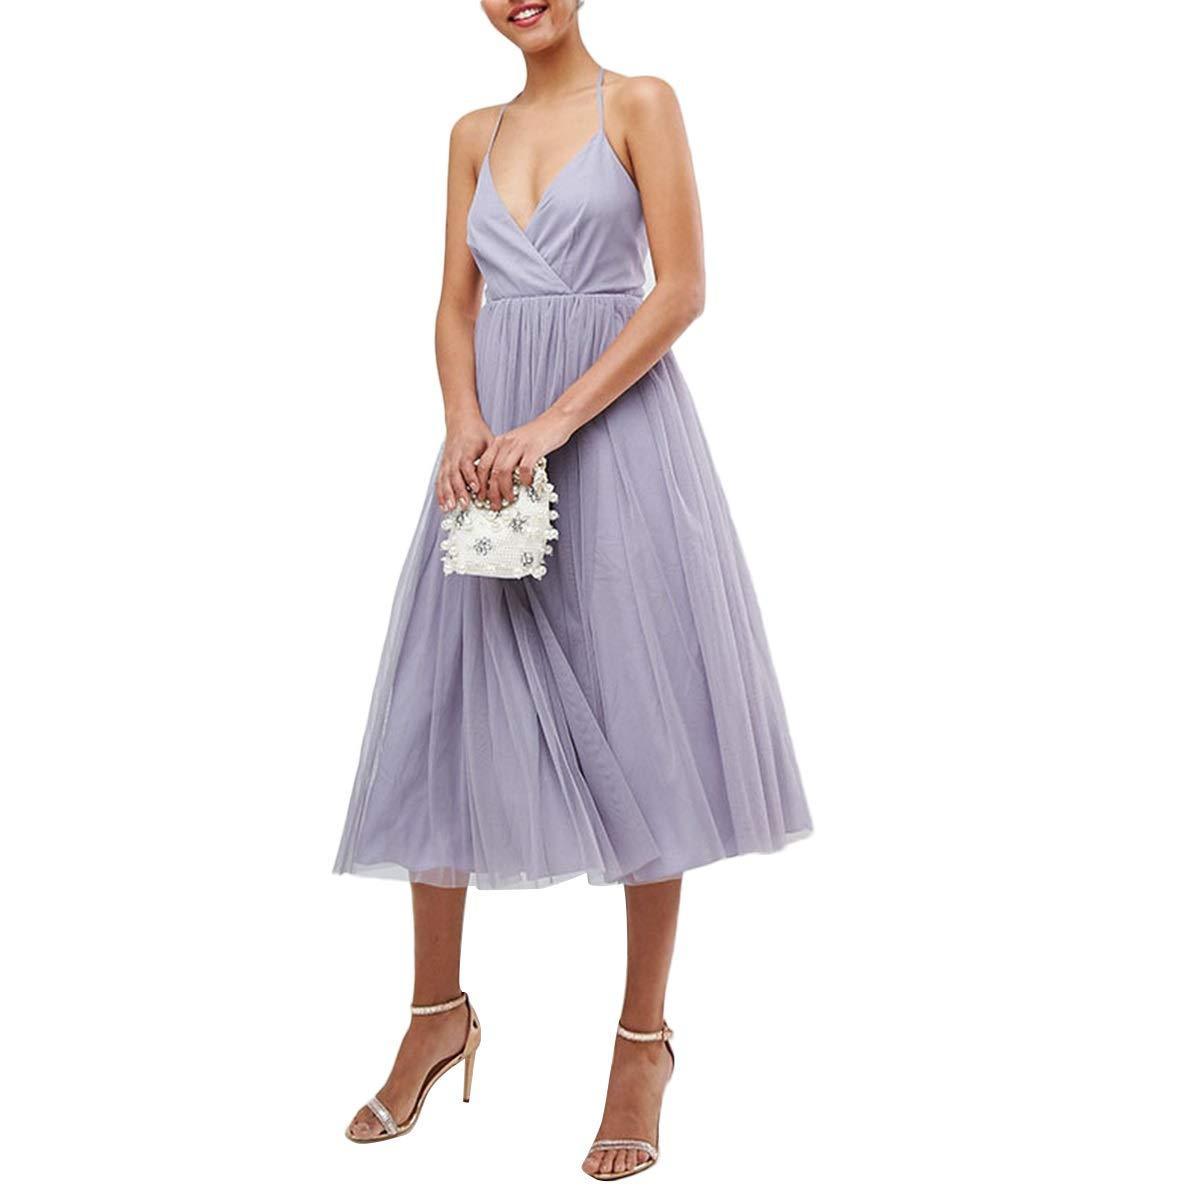 Jahurto Spaghetti Strap V Neck High Waist Swing Party Bridesmaid Evening Women Dress